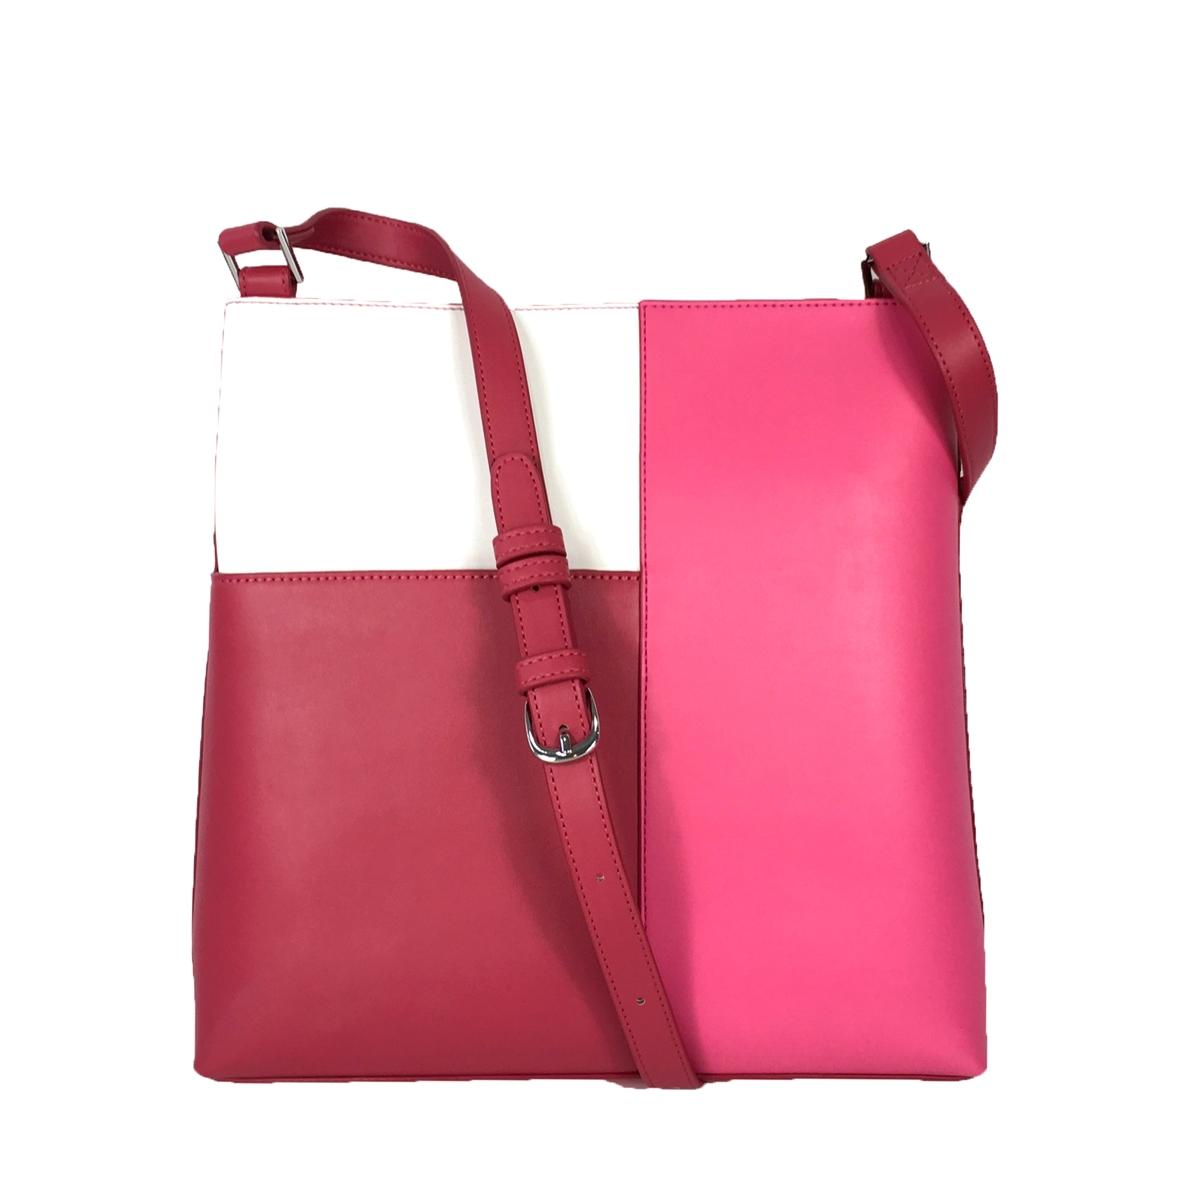 838c37f094 Vera Bradley Composition Faux Leather Crossbody Bag Larger Photo ...